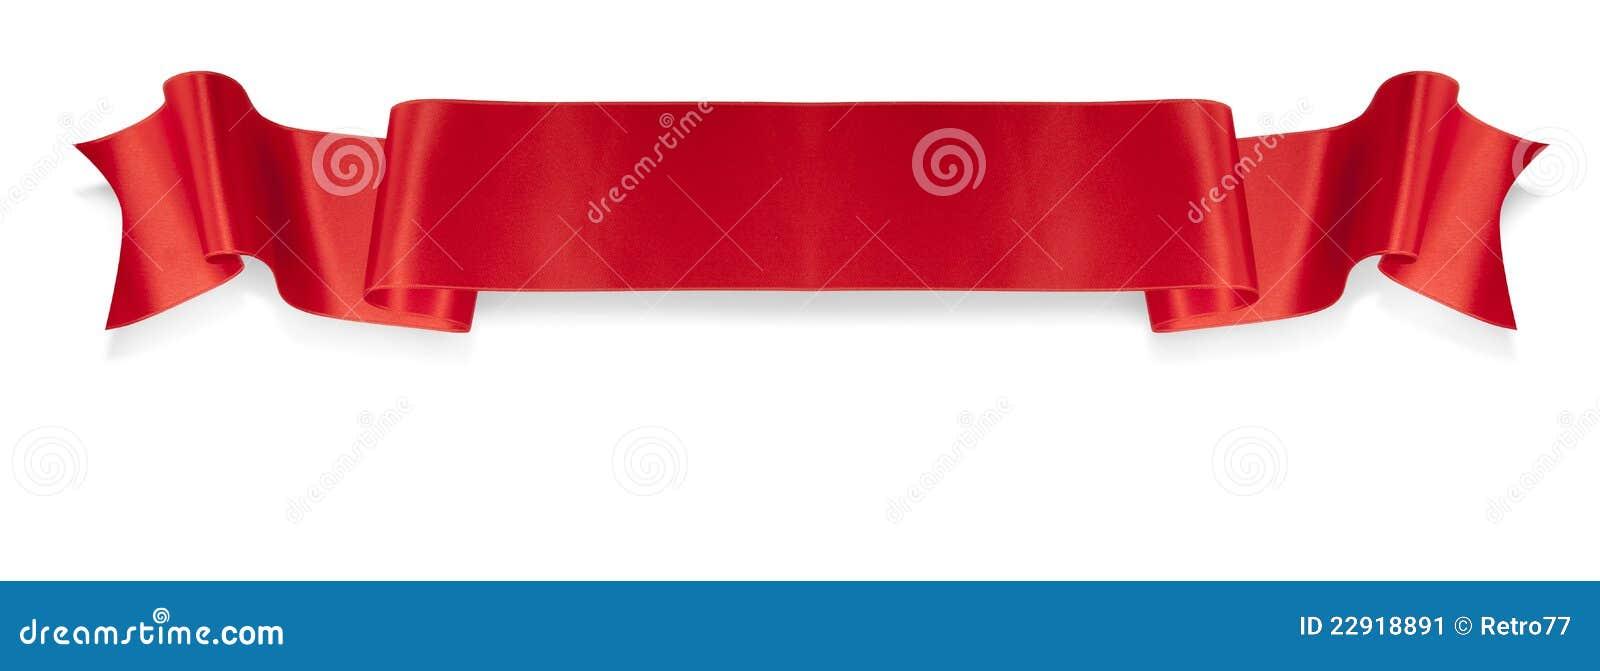 Bandiera rossa del nastro di eleganza